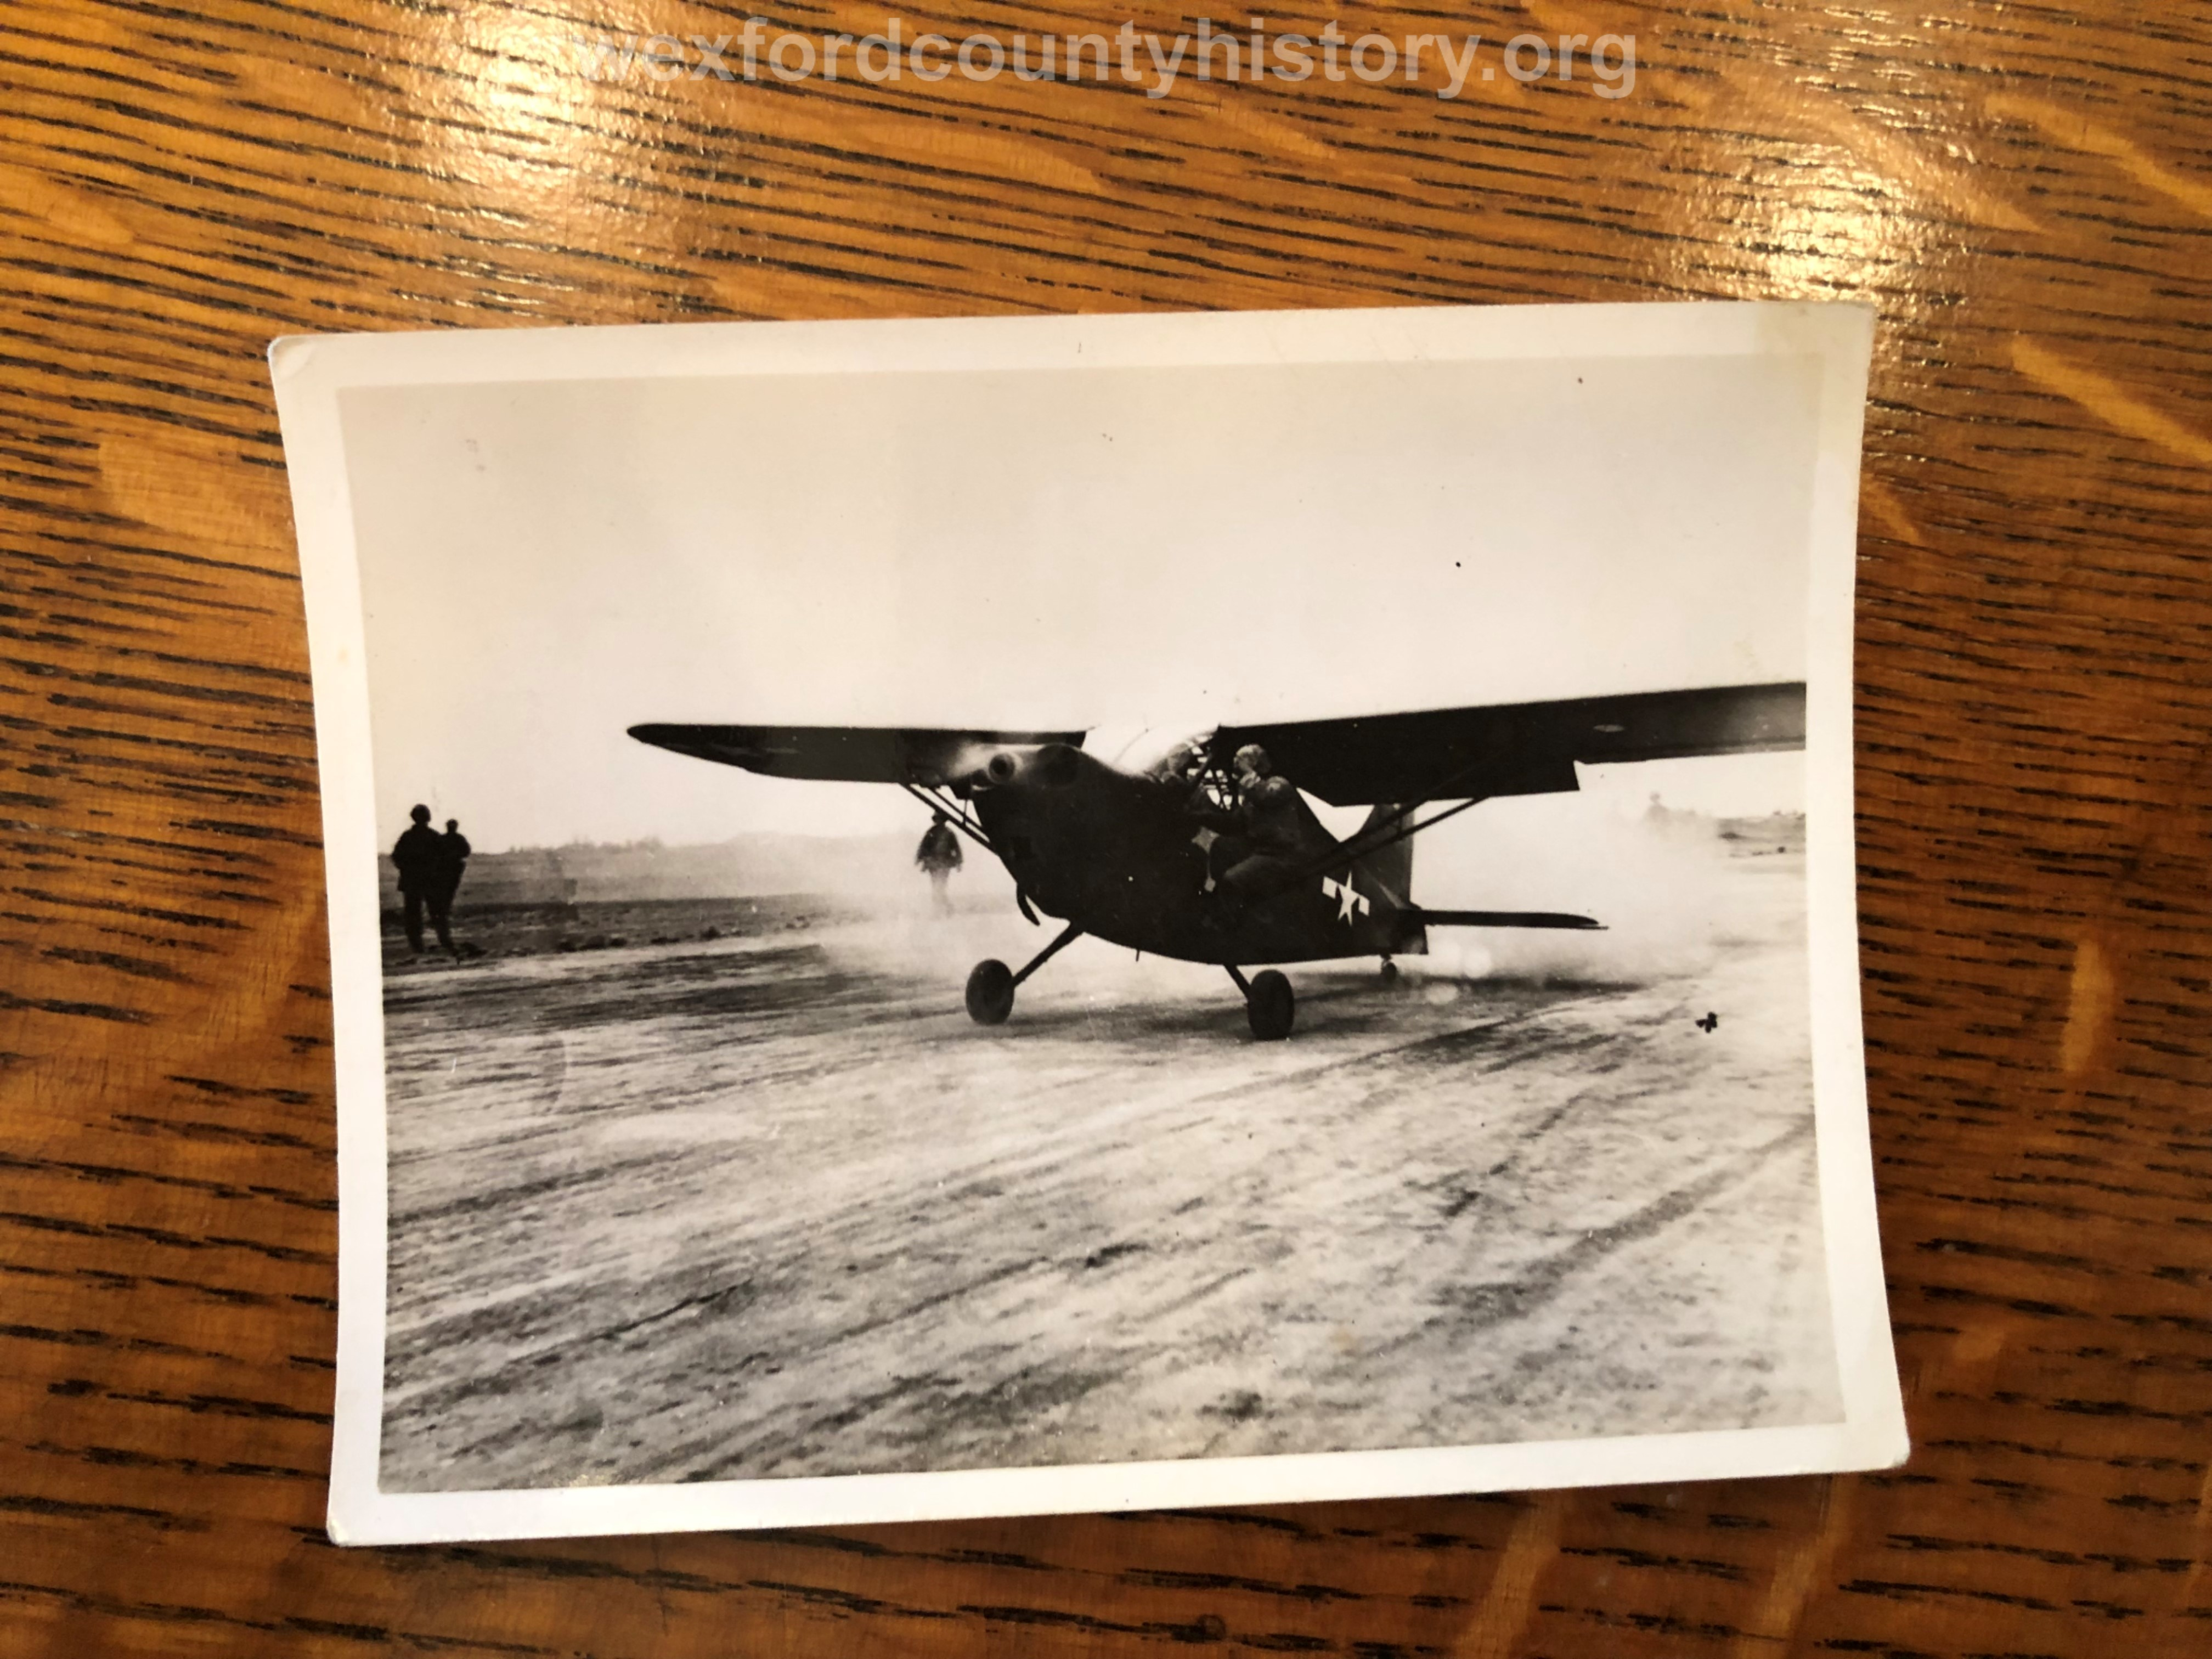 Cadillac-Veterans-Paul-Johnson-World-War-2-Photographs-31